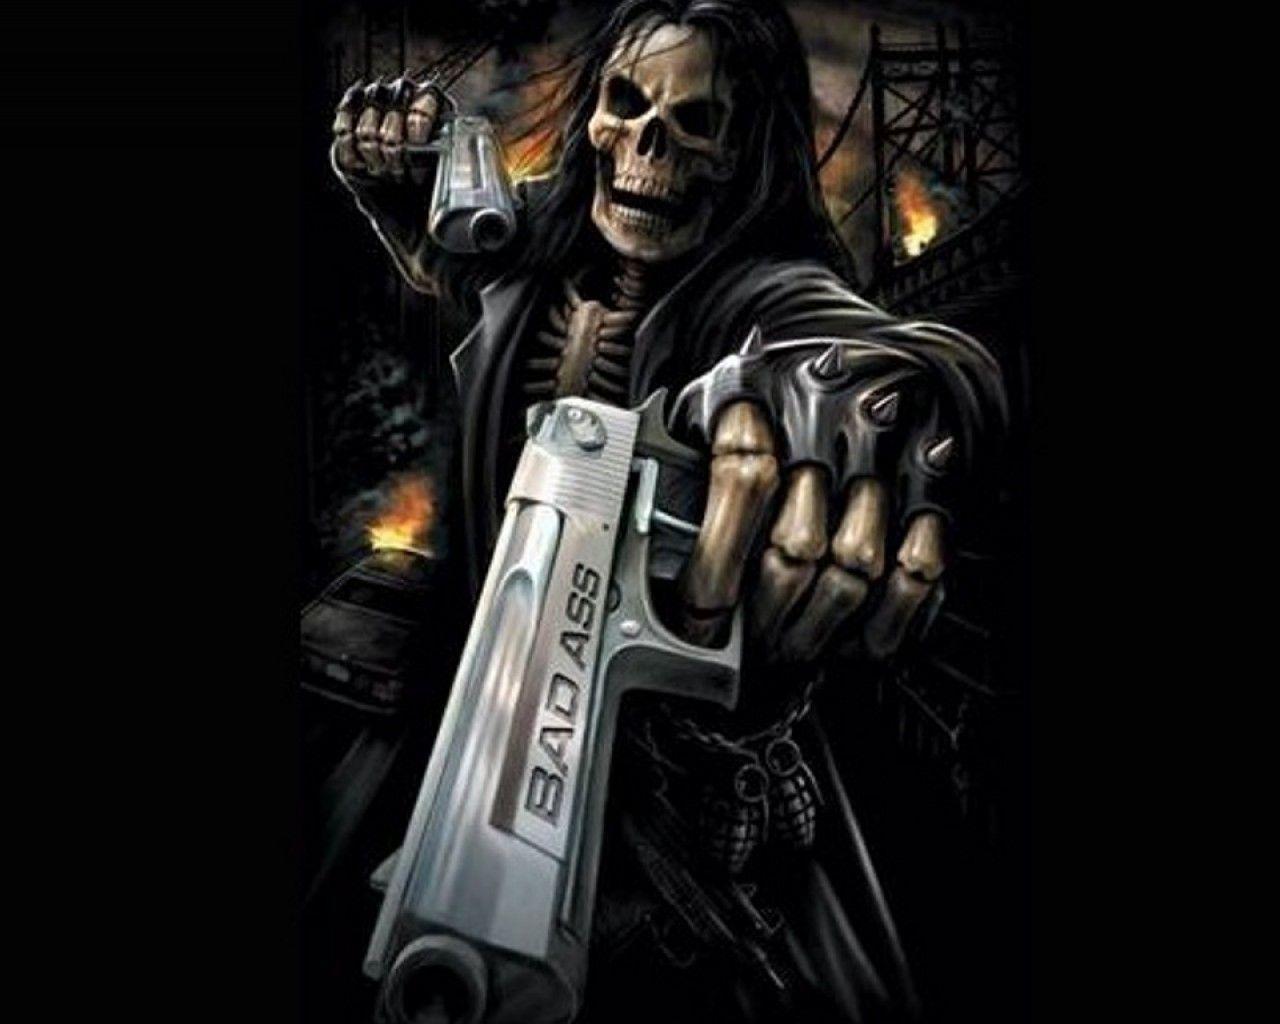 Cool Grim Reaper Wallpapers Top Free Cool Grim Reaper Backgrounds Wallpaperaccess